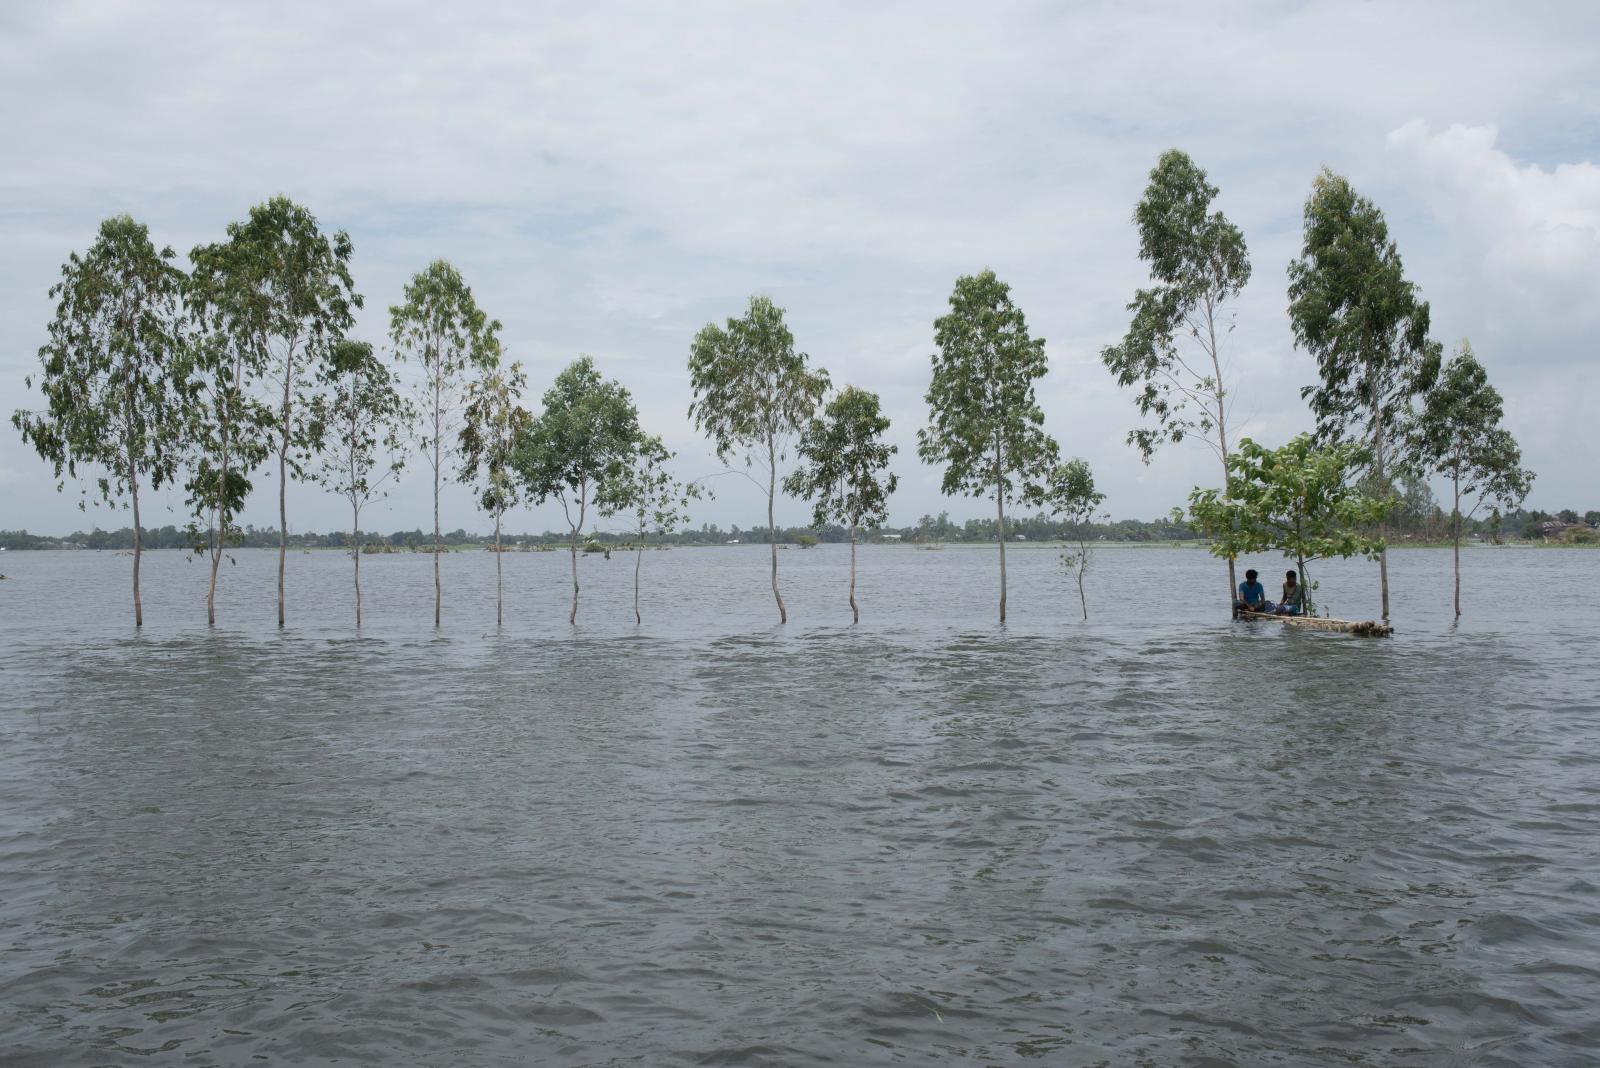 Photography image - Loading 20200811-Depth_Of_Flood14.jpg